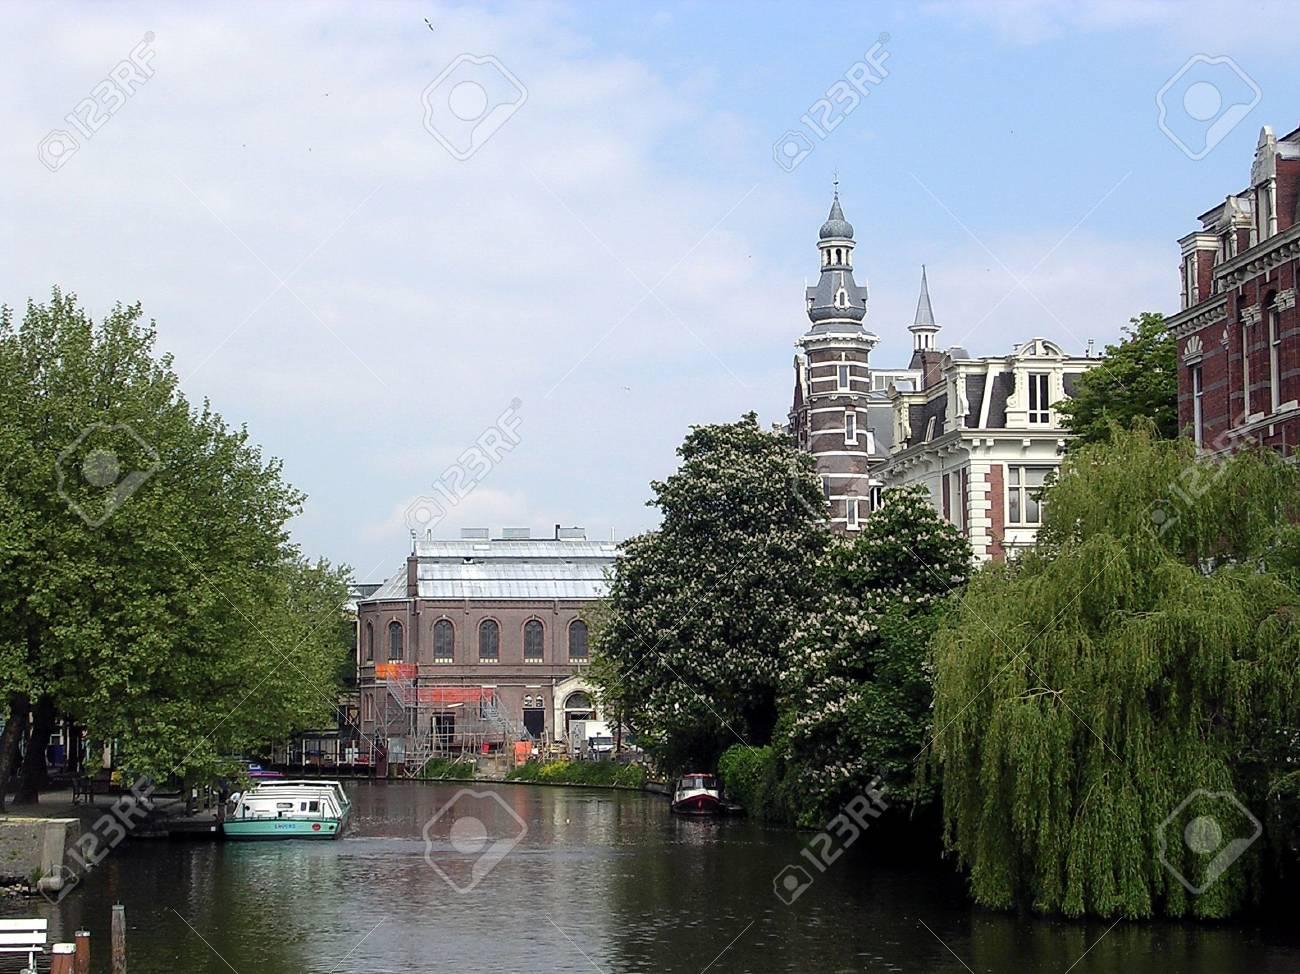 Nassaukade street and canal in Amsterdam, Netherlands Stock Photo - 7304983